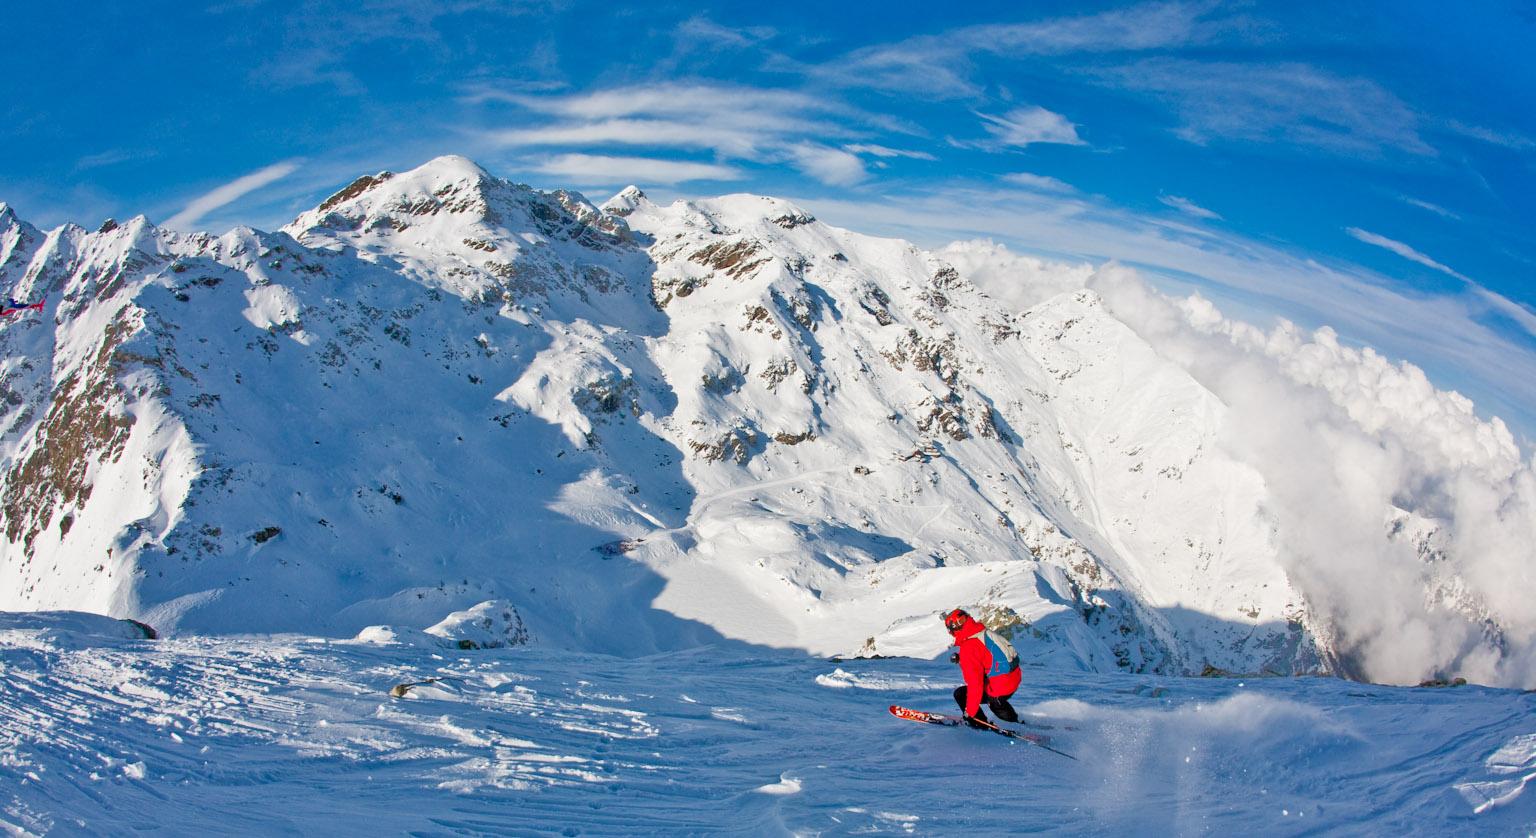 Valle Oropa, Monte Mucrone, versante nord: discesa dall'anticima Freeride_limbo_0